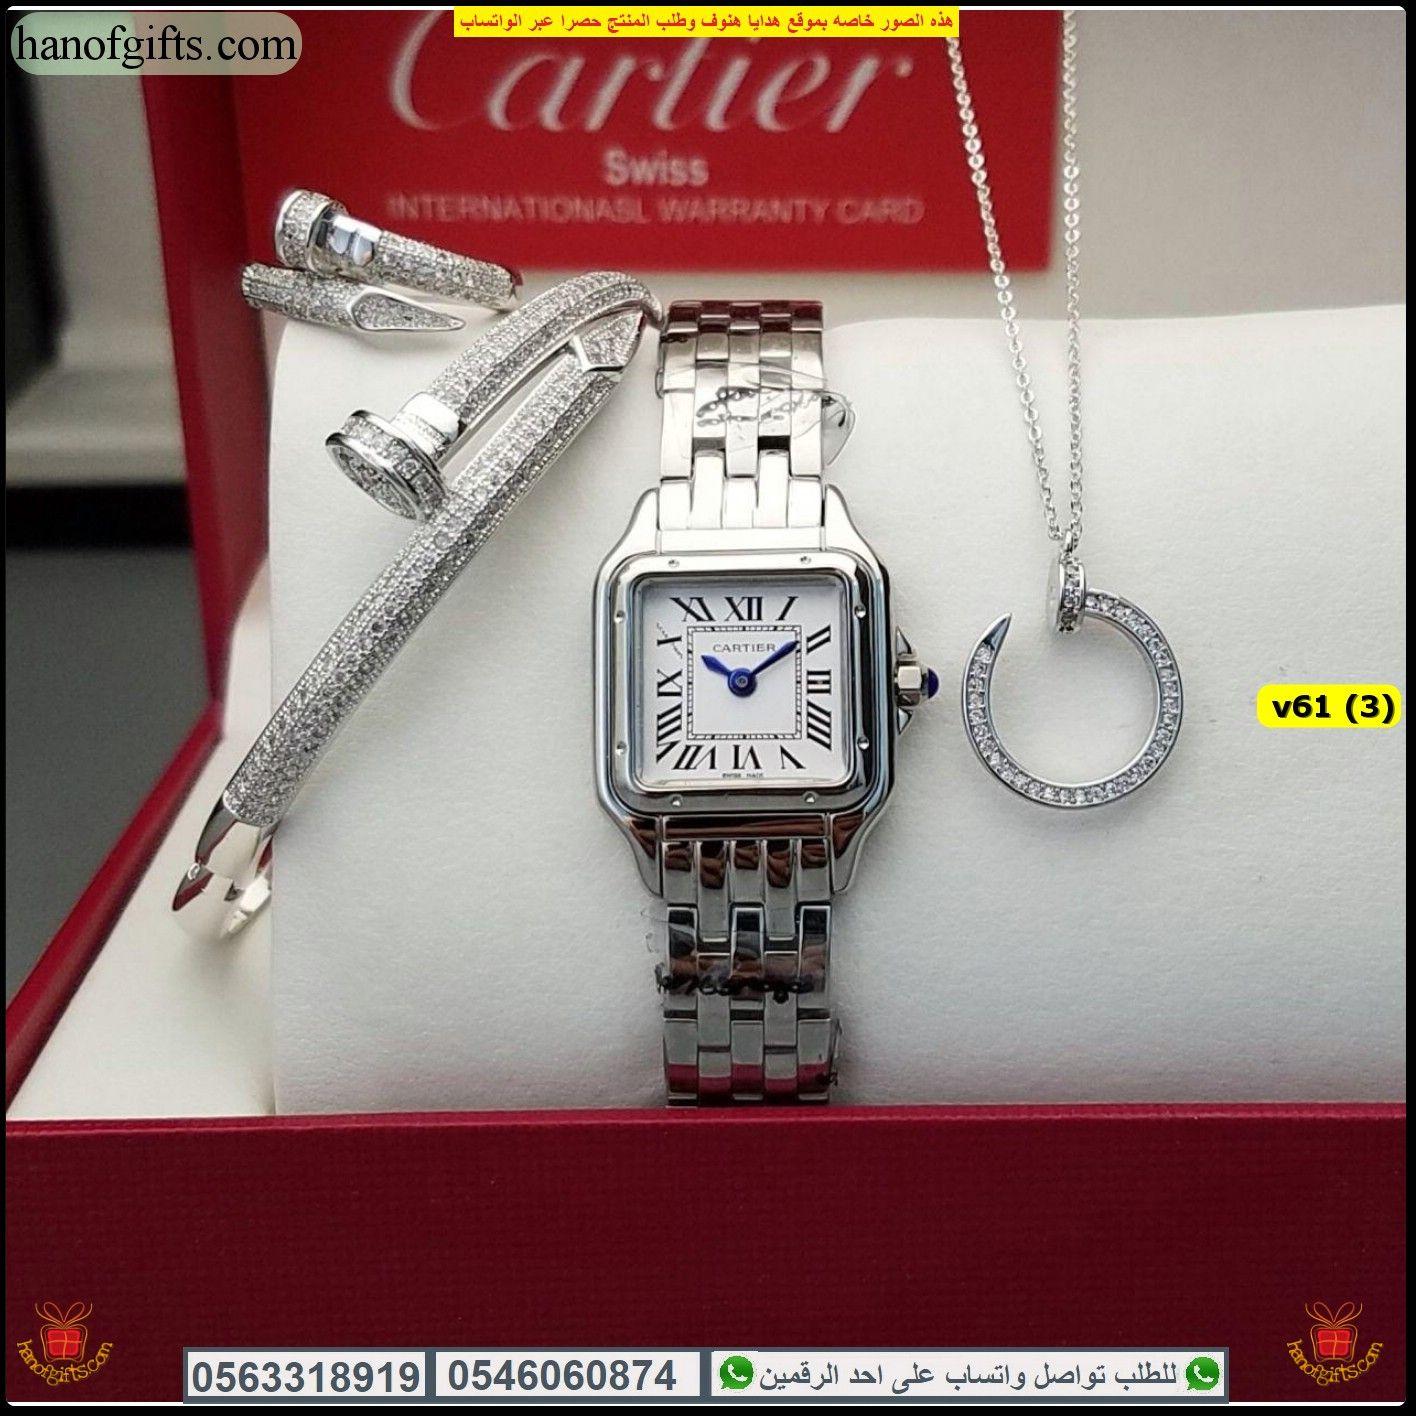 ساعات كارتير نسائي 2020 مع سواره مسمار كارتير مع تعليقة مسمار هدايا هنوف Square Watch Accessories Watches